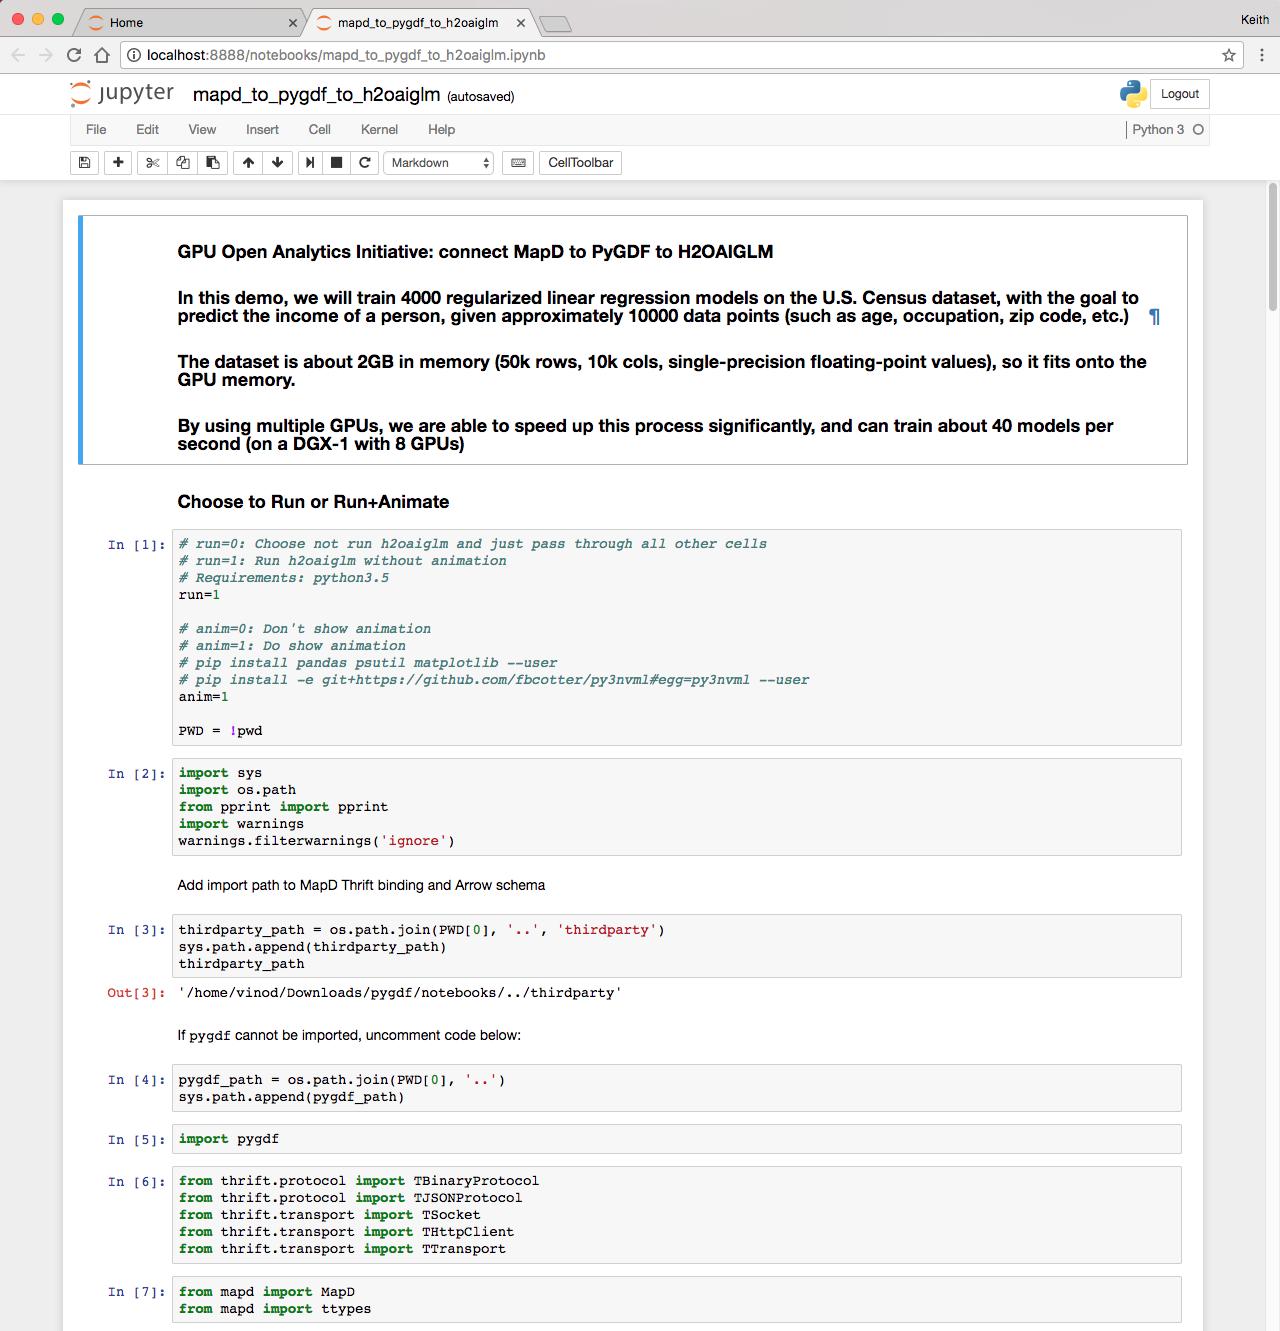 Figure 3: The GPU Open Analytics Initiative (GOAI) demo Python notebook running in a browser.